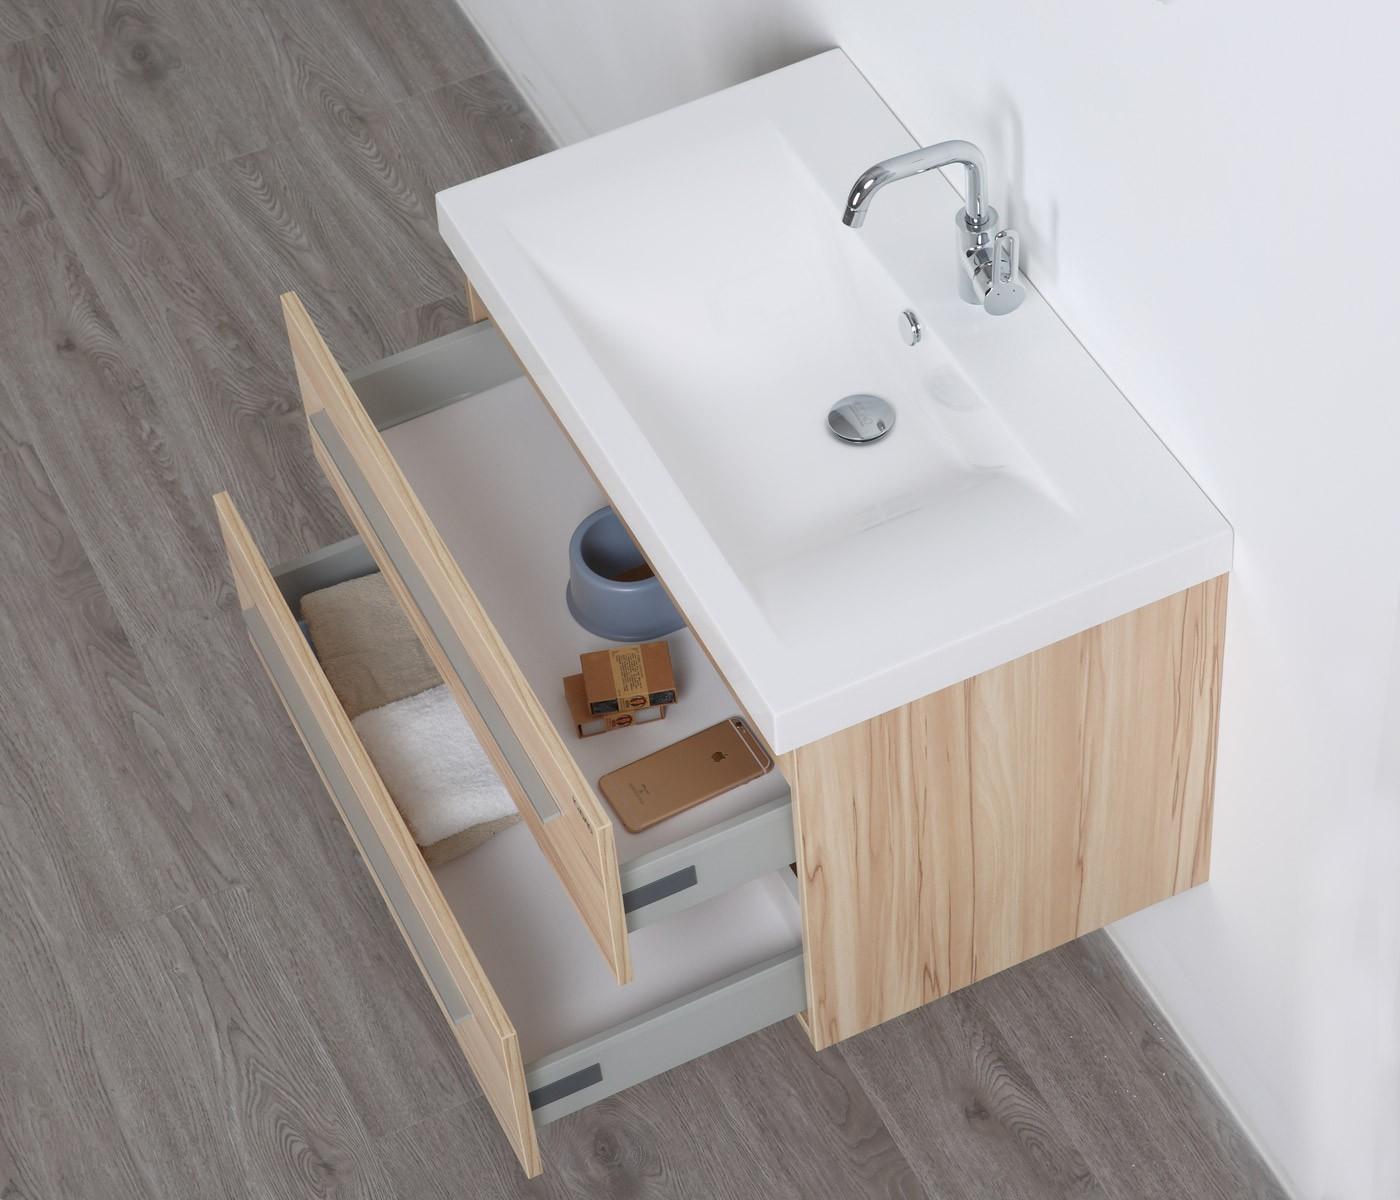 rom waschtisch-set 80 cm kernahorn badewelt badezimmer möbel, Badezimmer ideen